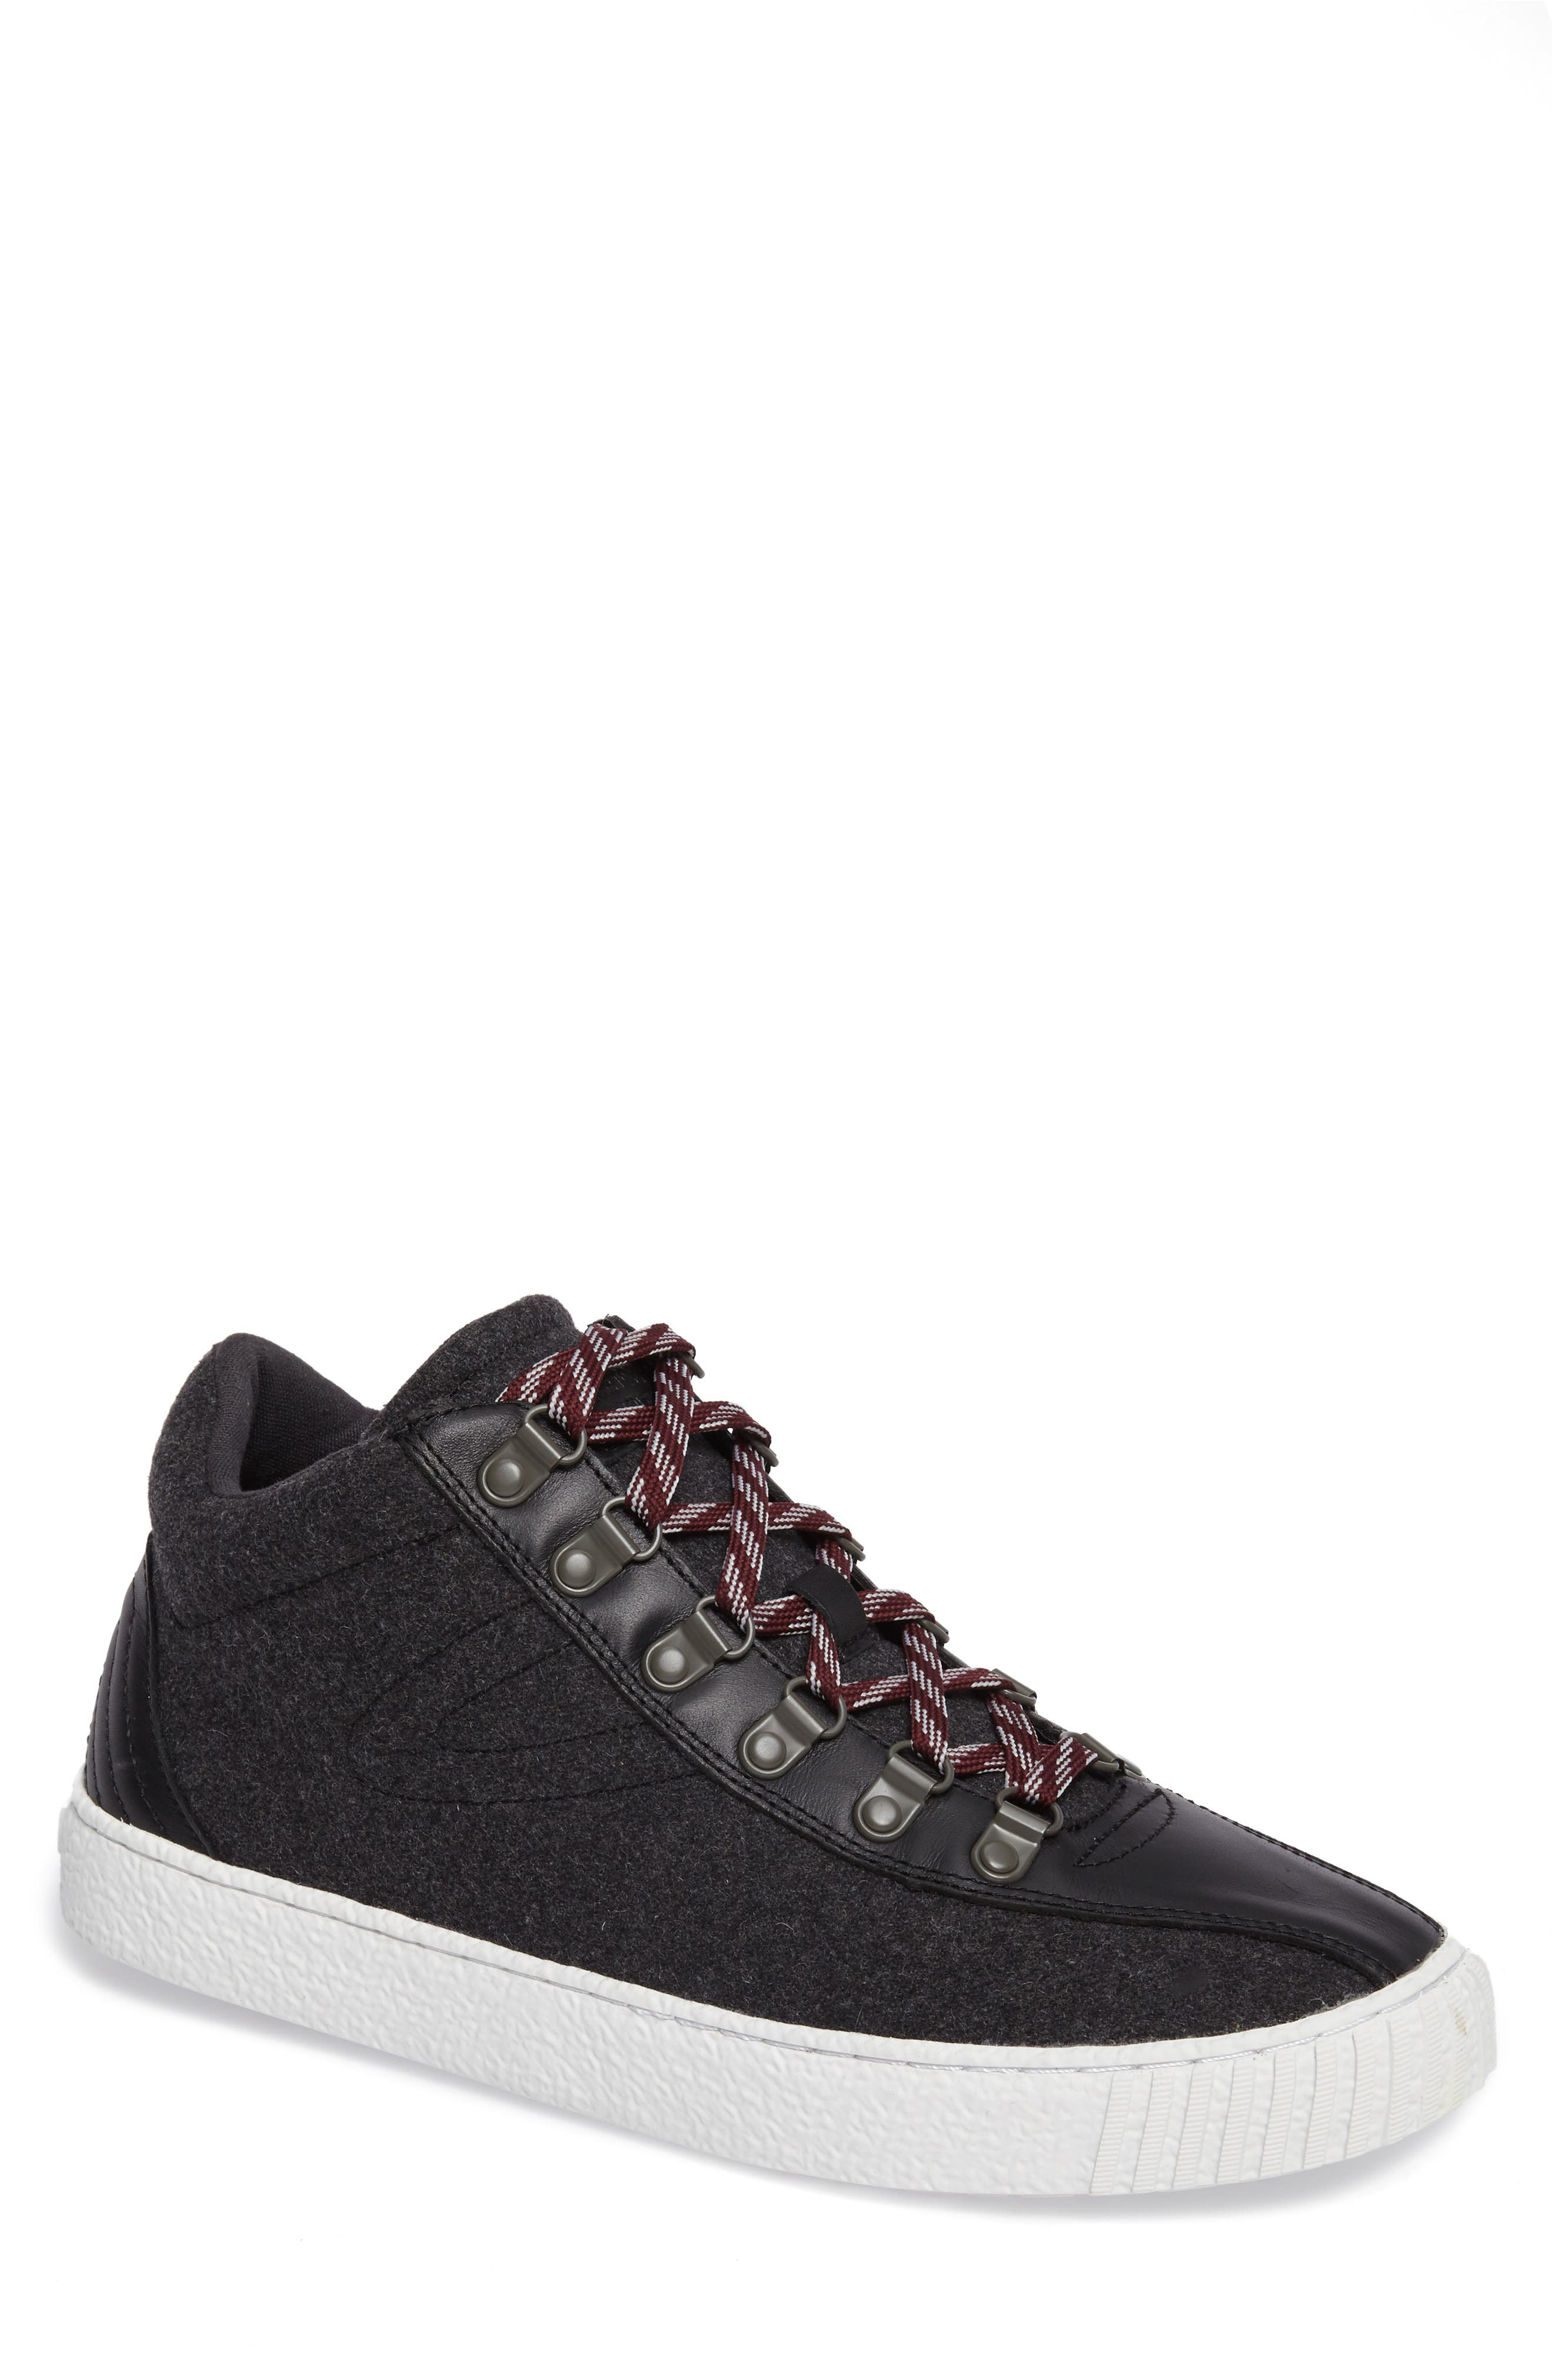 Tretorn Dante Sneaker (Men)